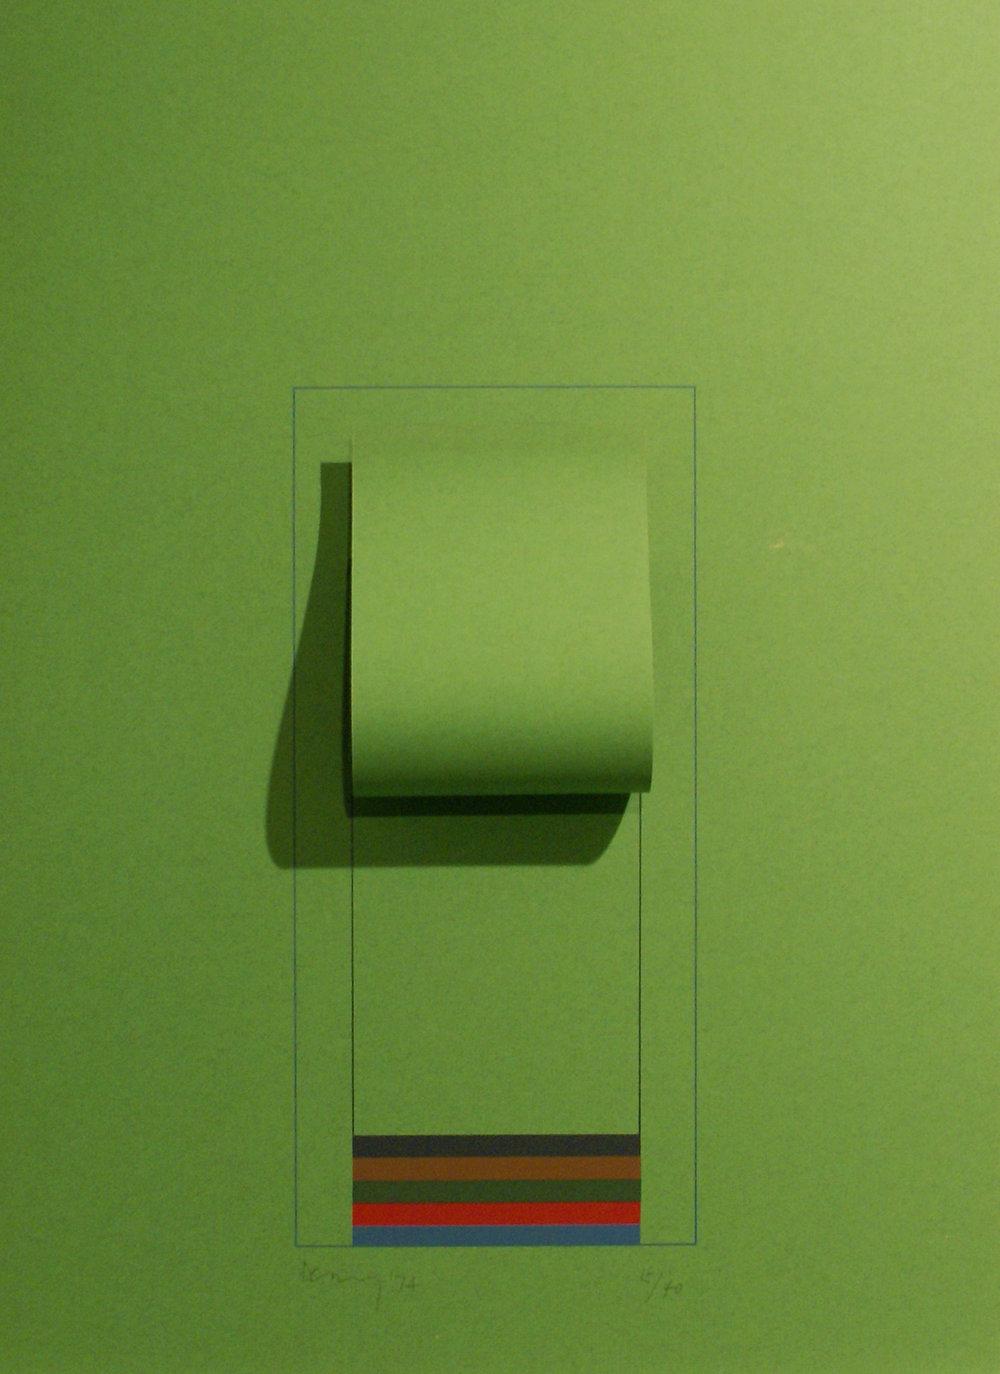 Mirrors (Bright Green), 1974